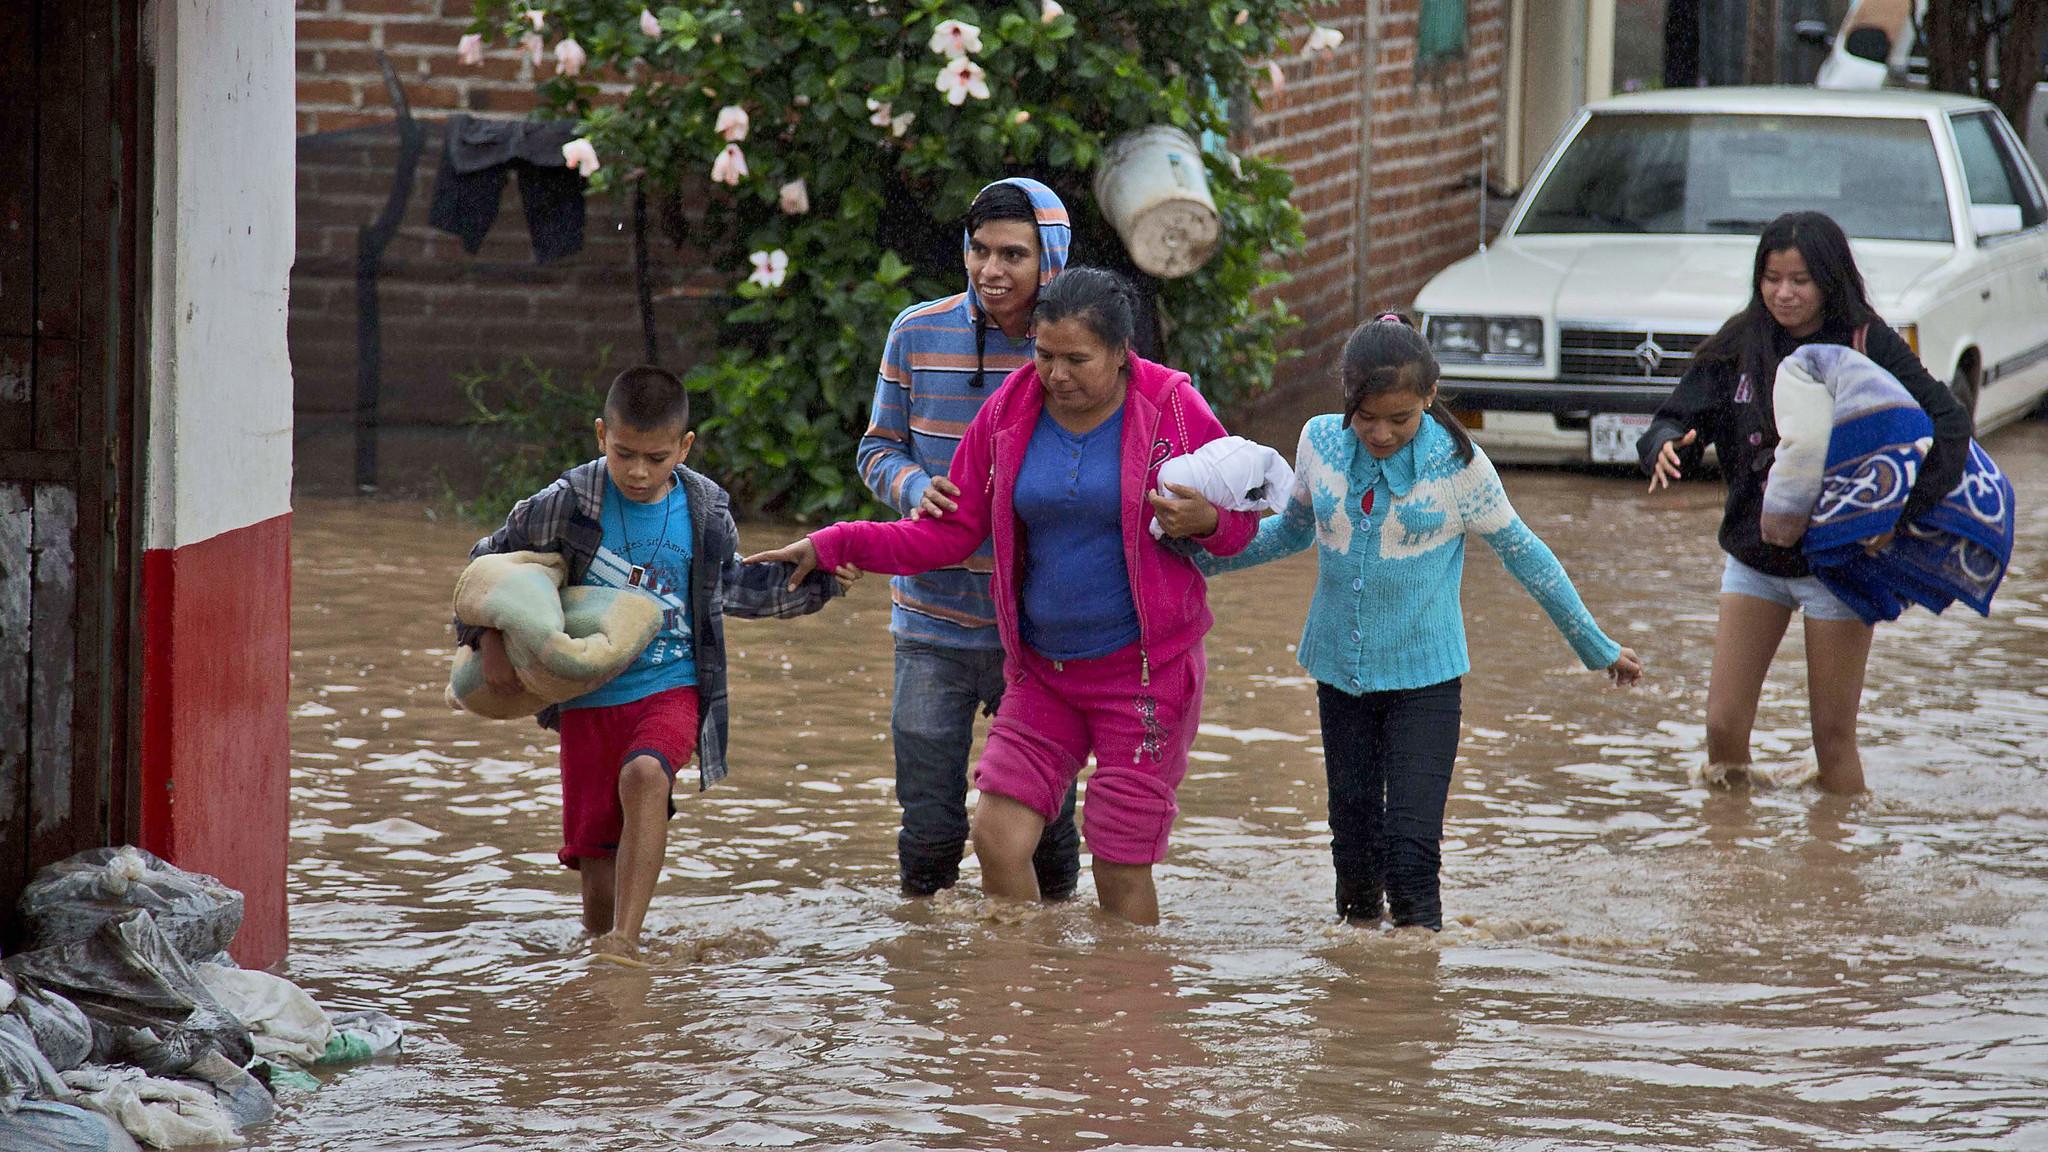 How mammoth Hurricane Patricia grew so powerful so fast - Los Angeles Times